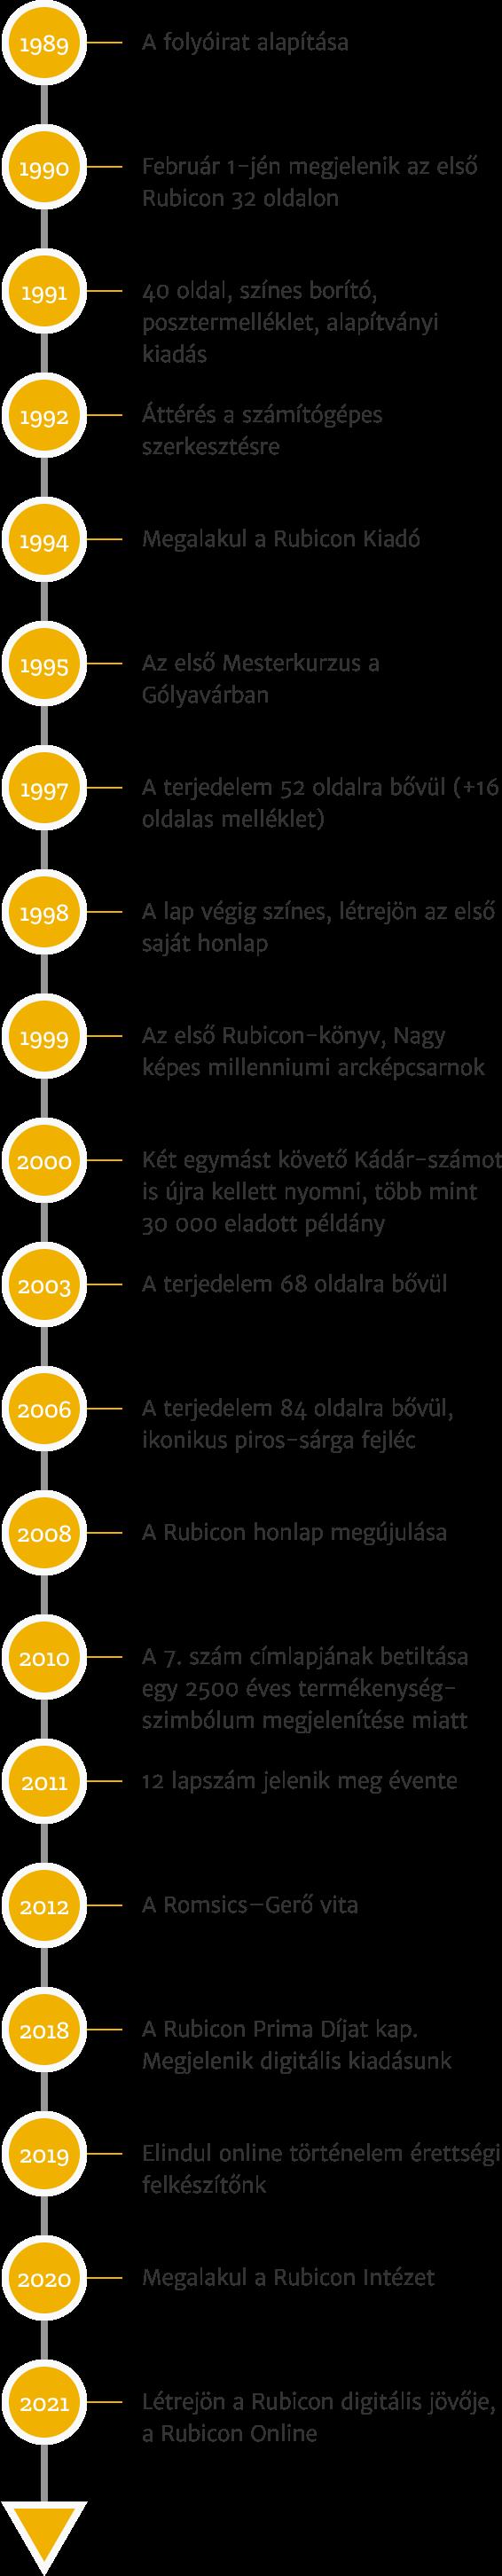 Rubicon történelme